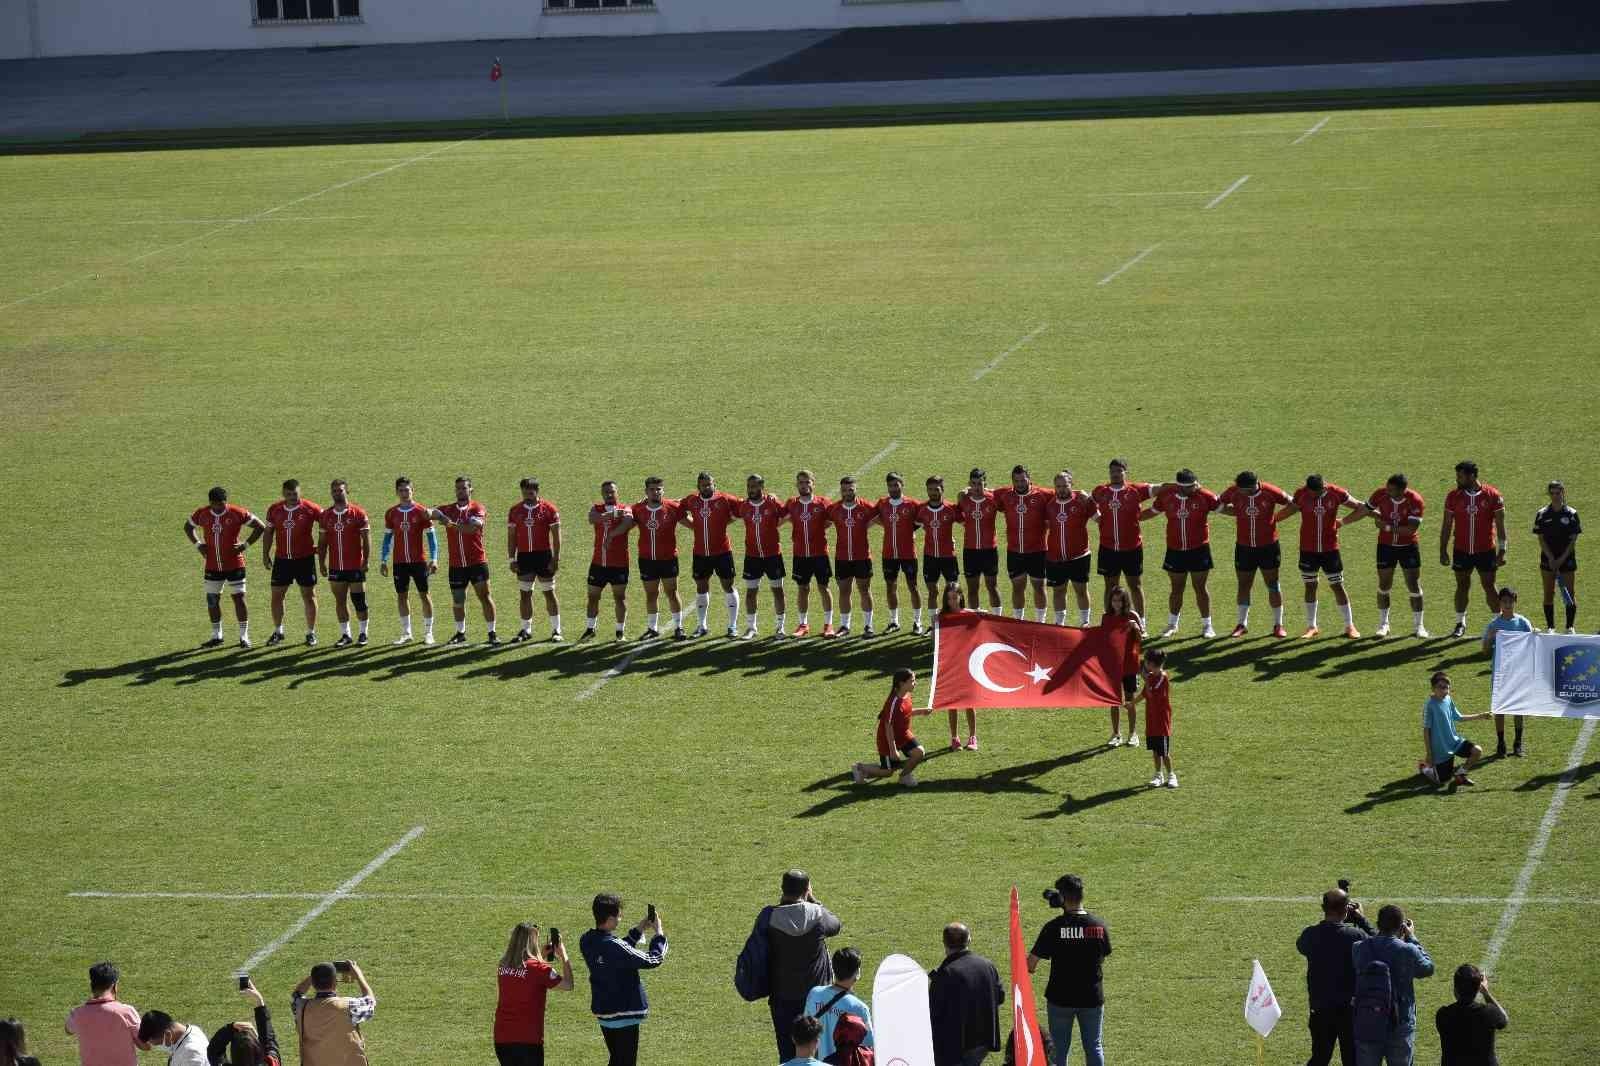 Ragbi Milli Takımı, Andorra'ya mağlup oldu #burdur